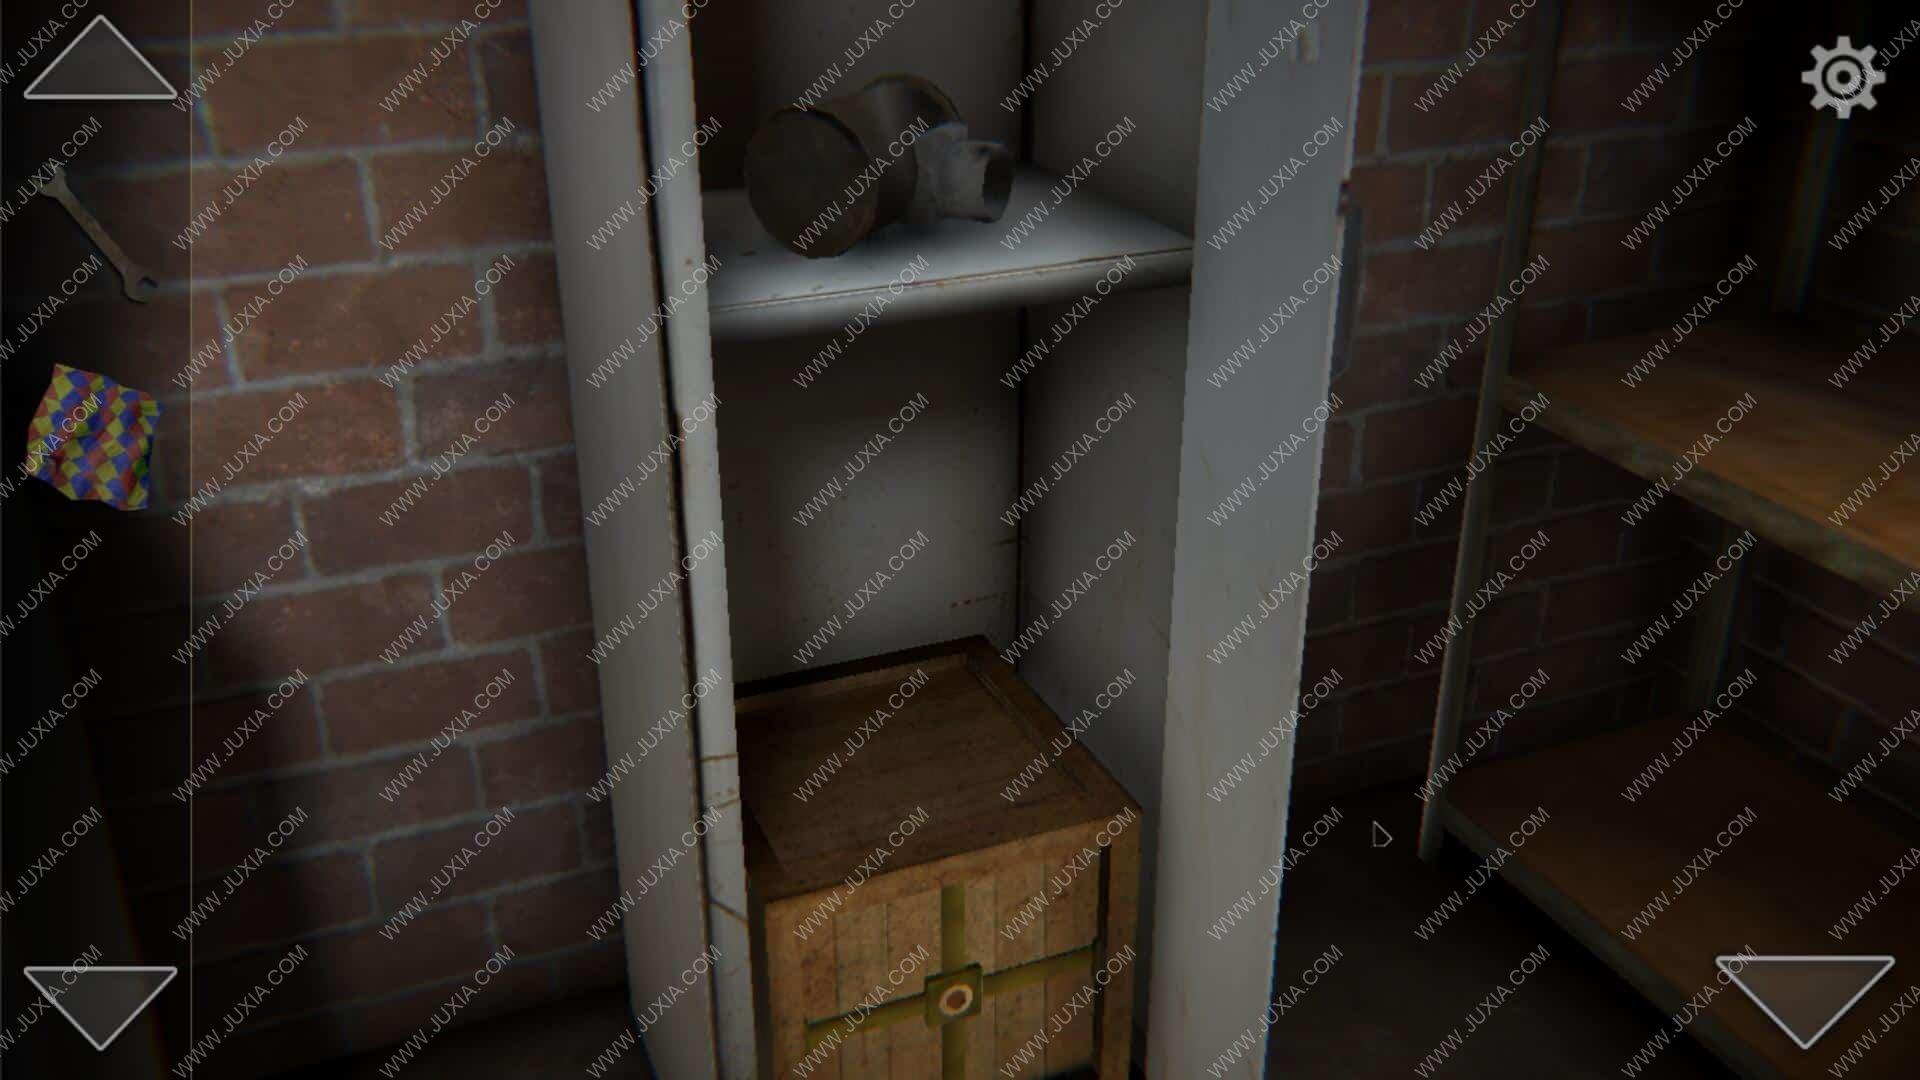 TheEscaper逃脱者攻略第二关下 room2修理室铁箱怎么过